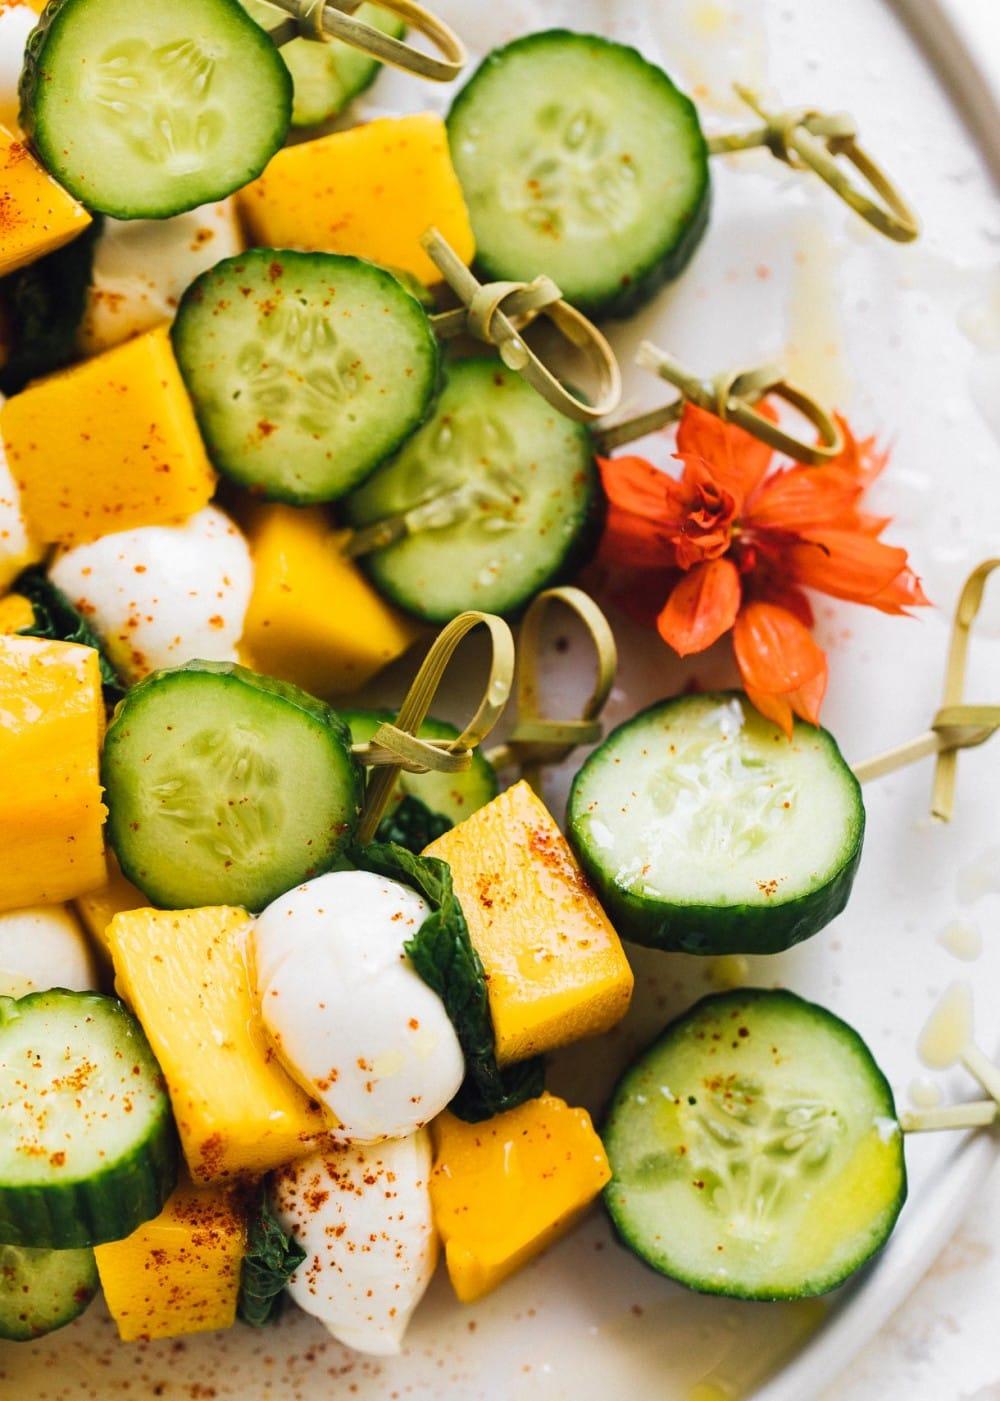 cucumber mango mozzarella skewers on a white plate